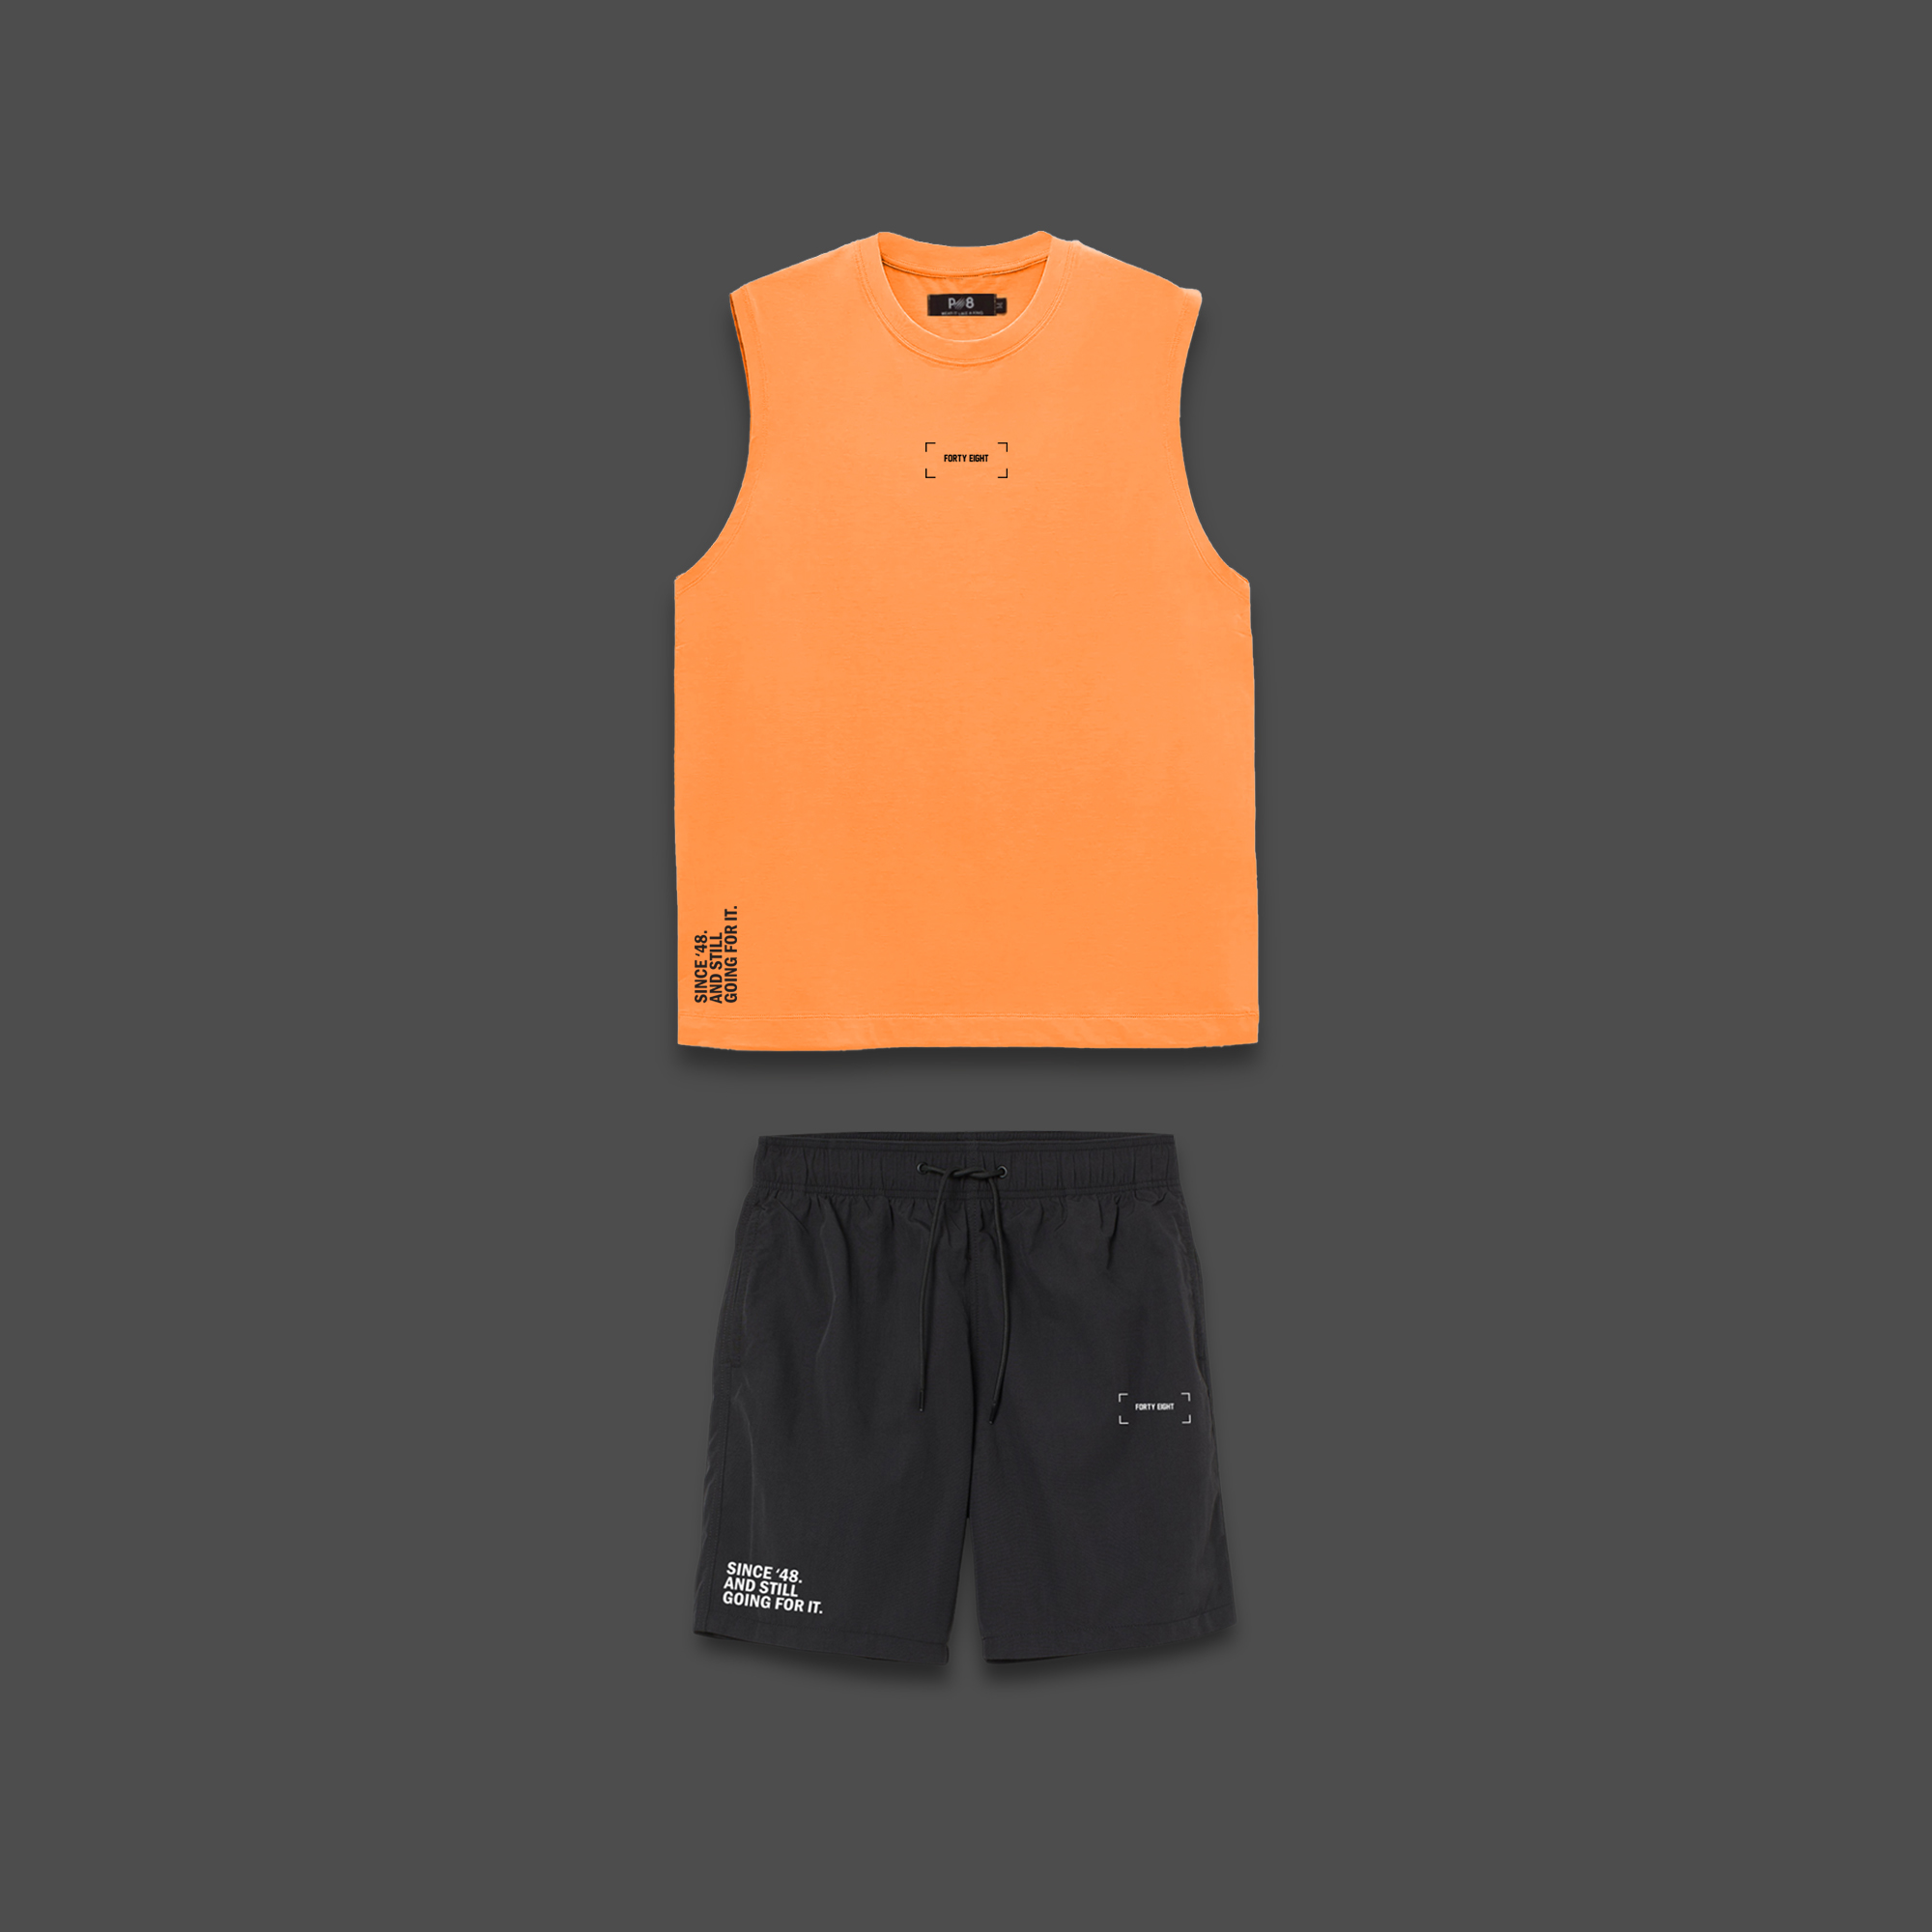 The 48 beach set - Orange & Black